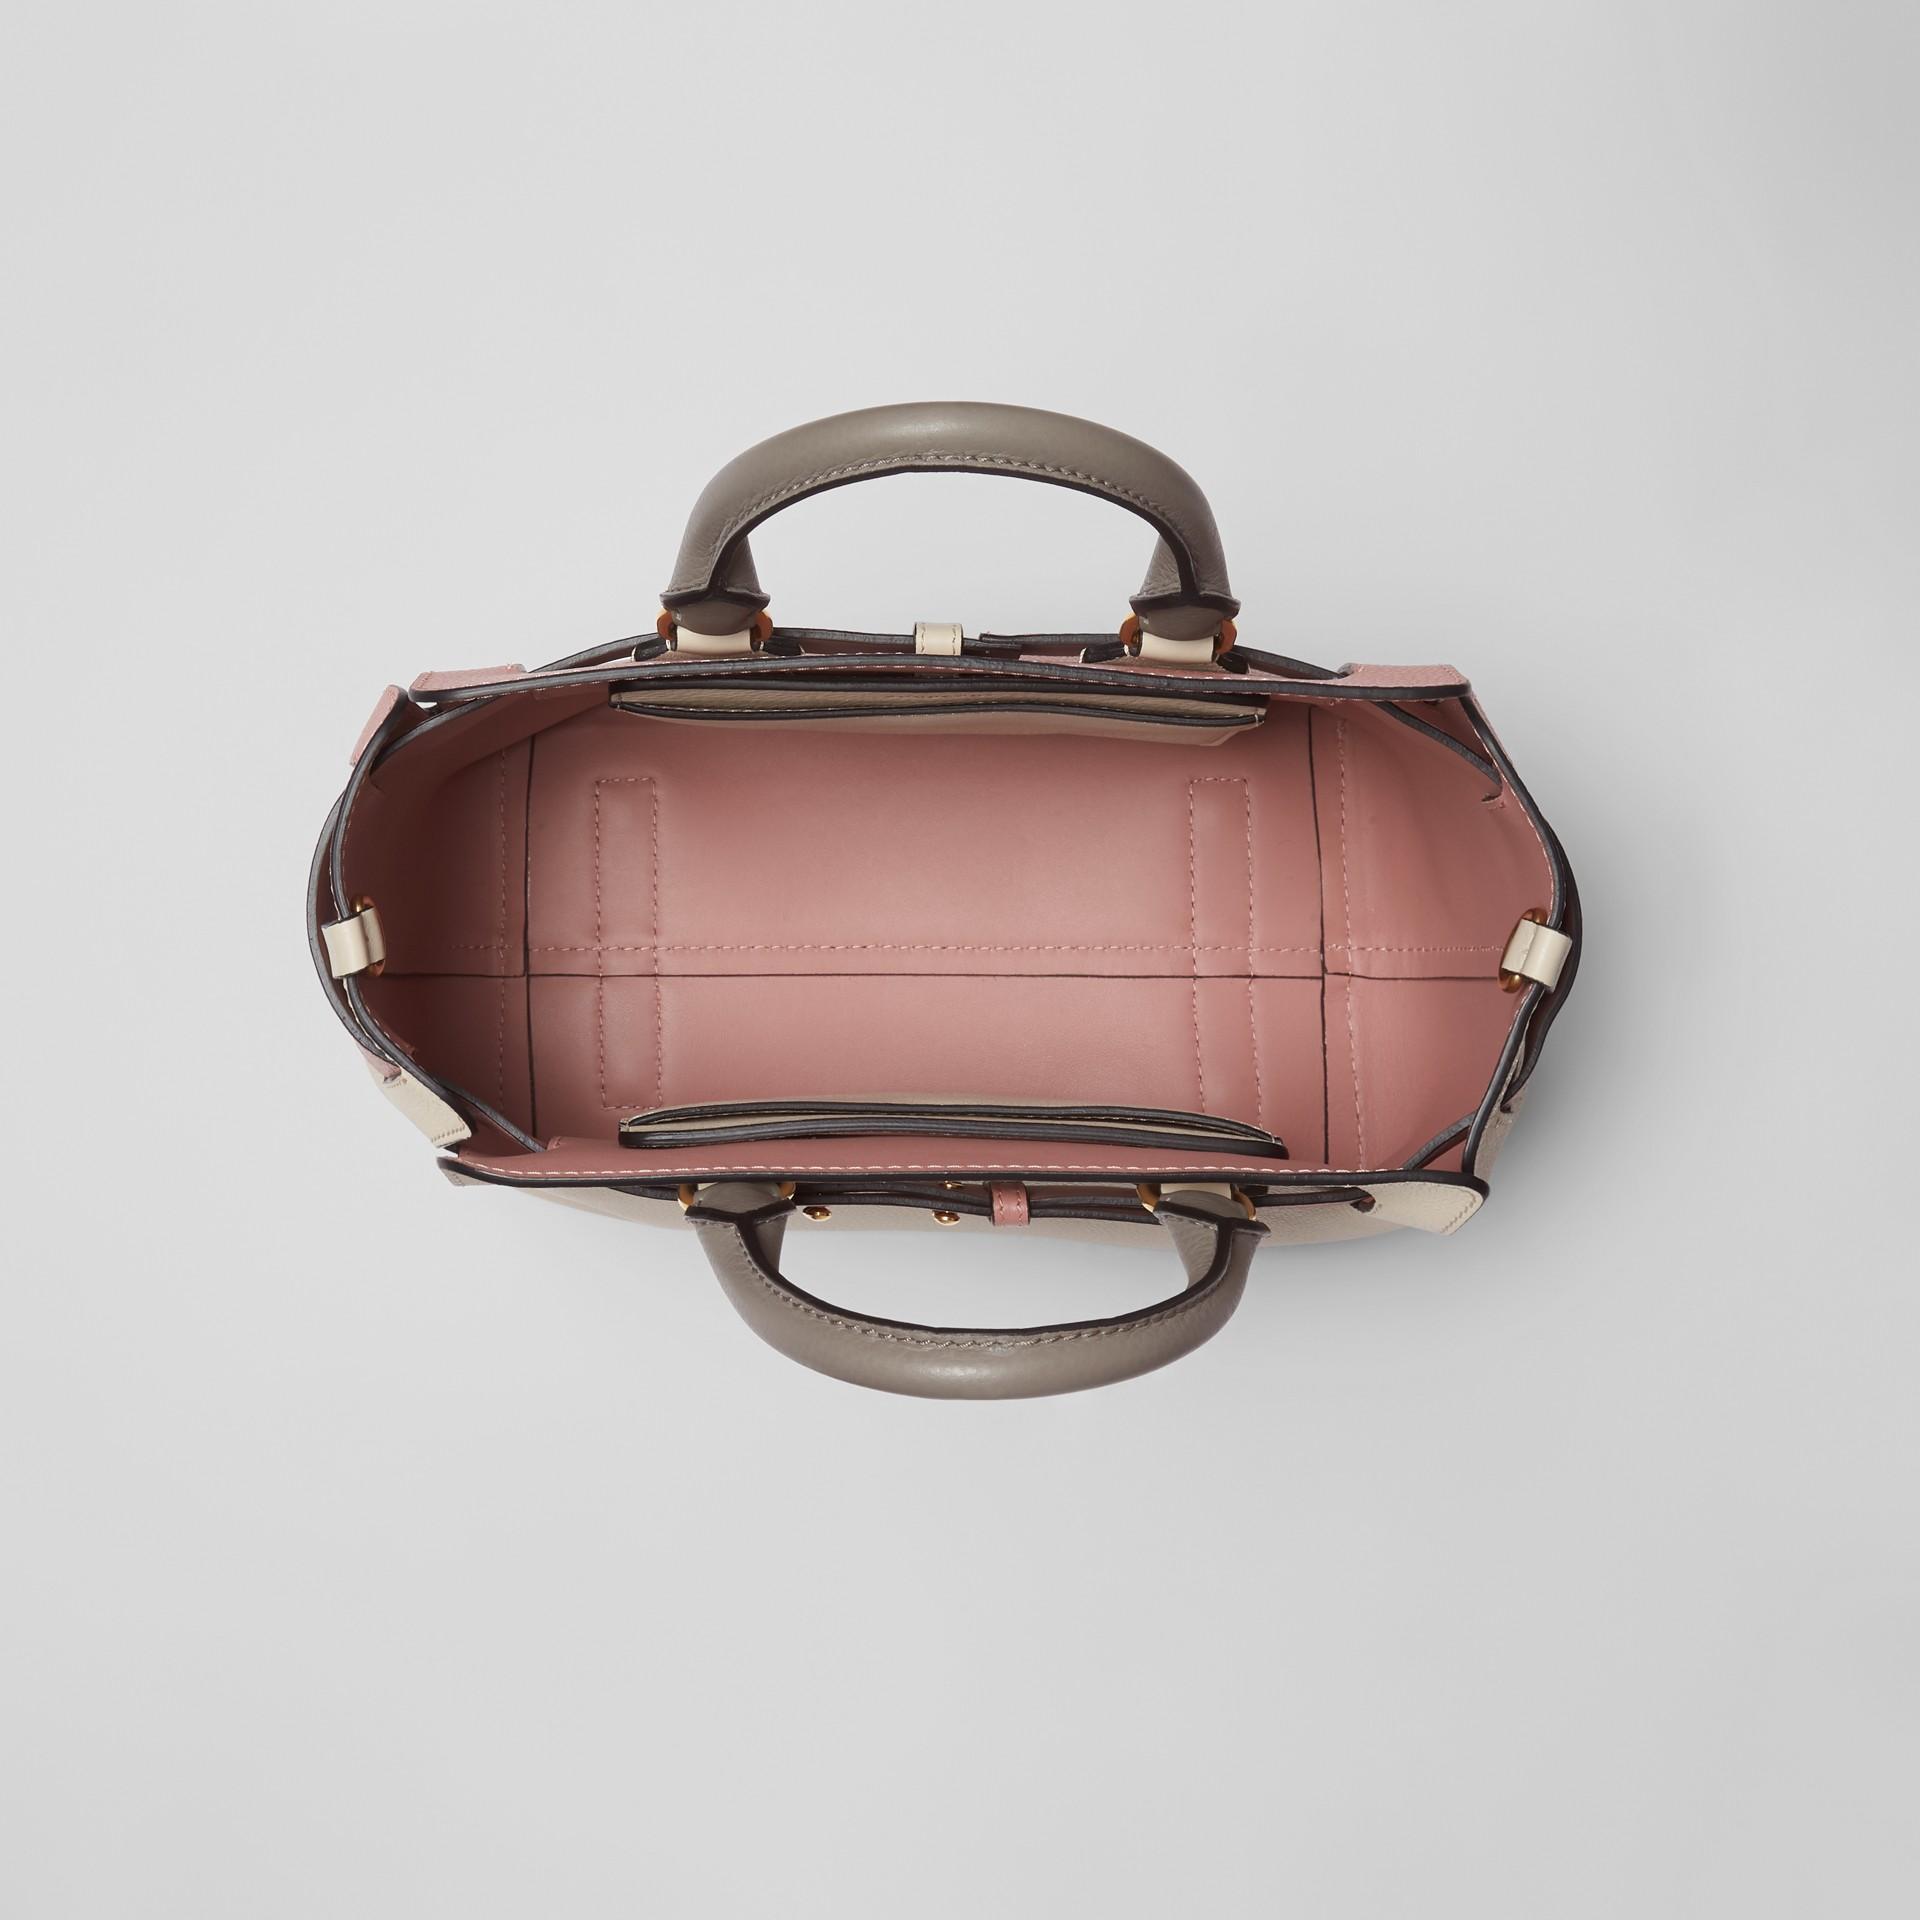 The Small Belt Bag aus Leder in Dreitonoptik (Kalksteinfarben/altrosenfarben) - Damen | Burberry - Galerie-Bild 5